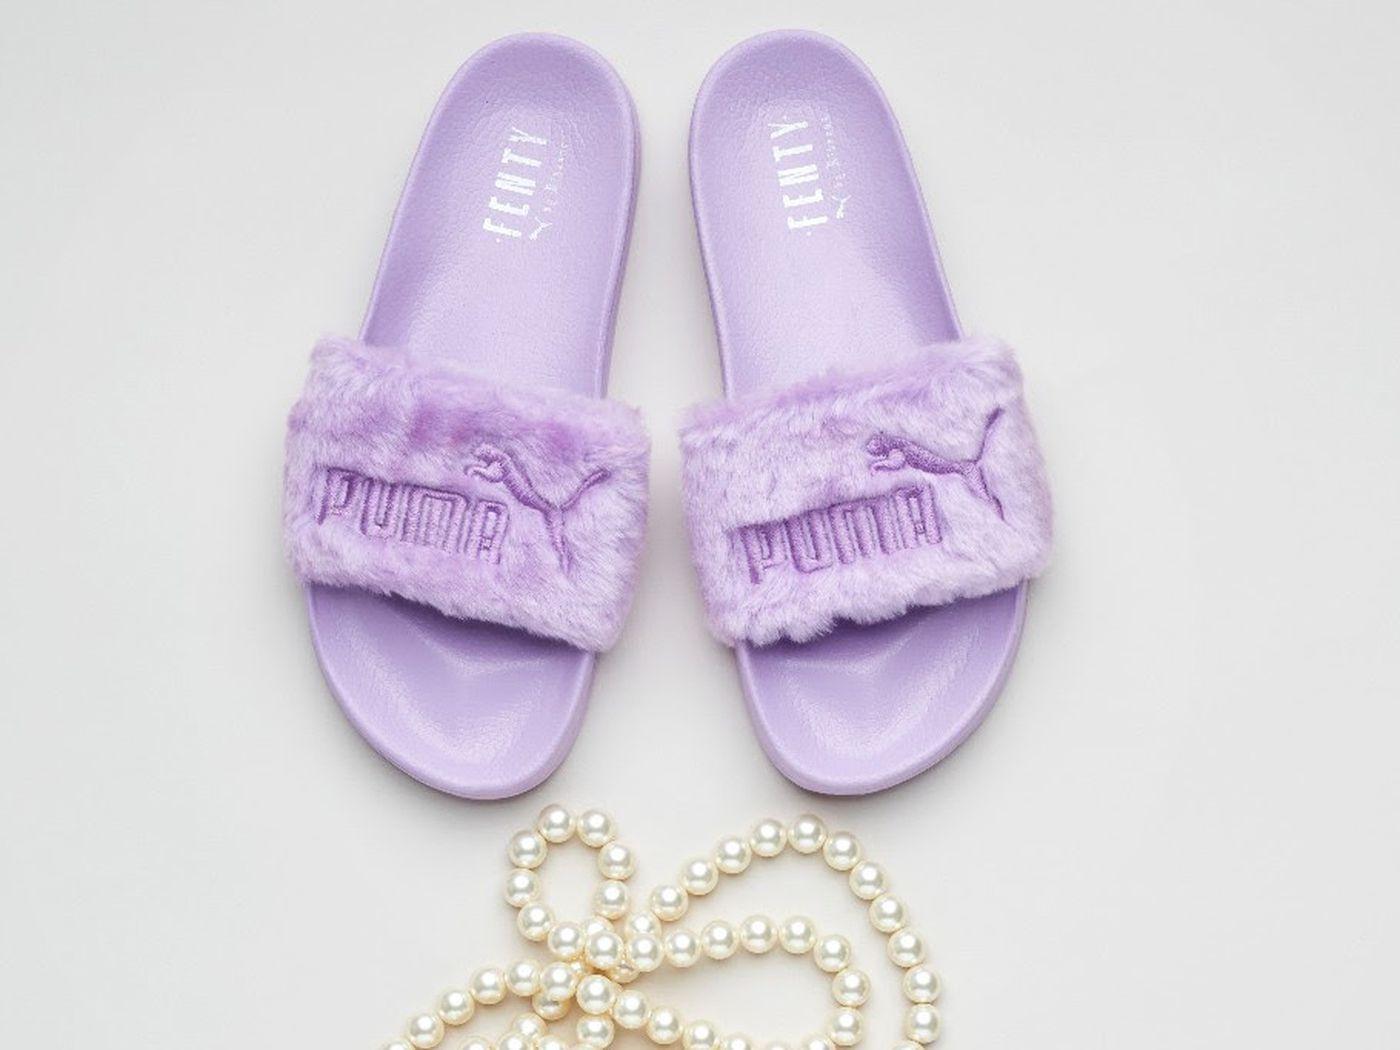 2aede89aaa7 Where to Buy Rihanna s Fenty Puma Fur Slides - Racked